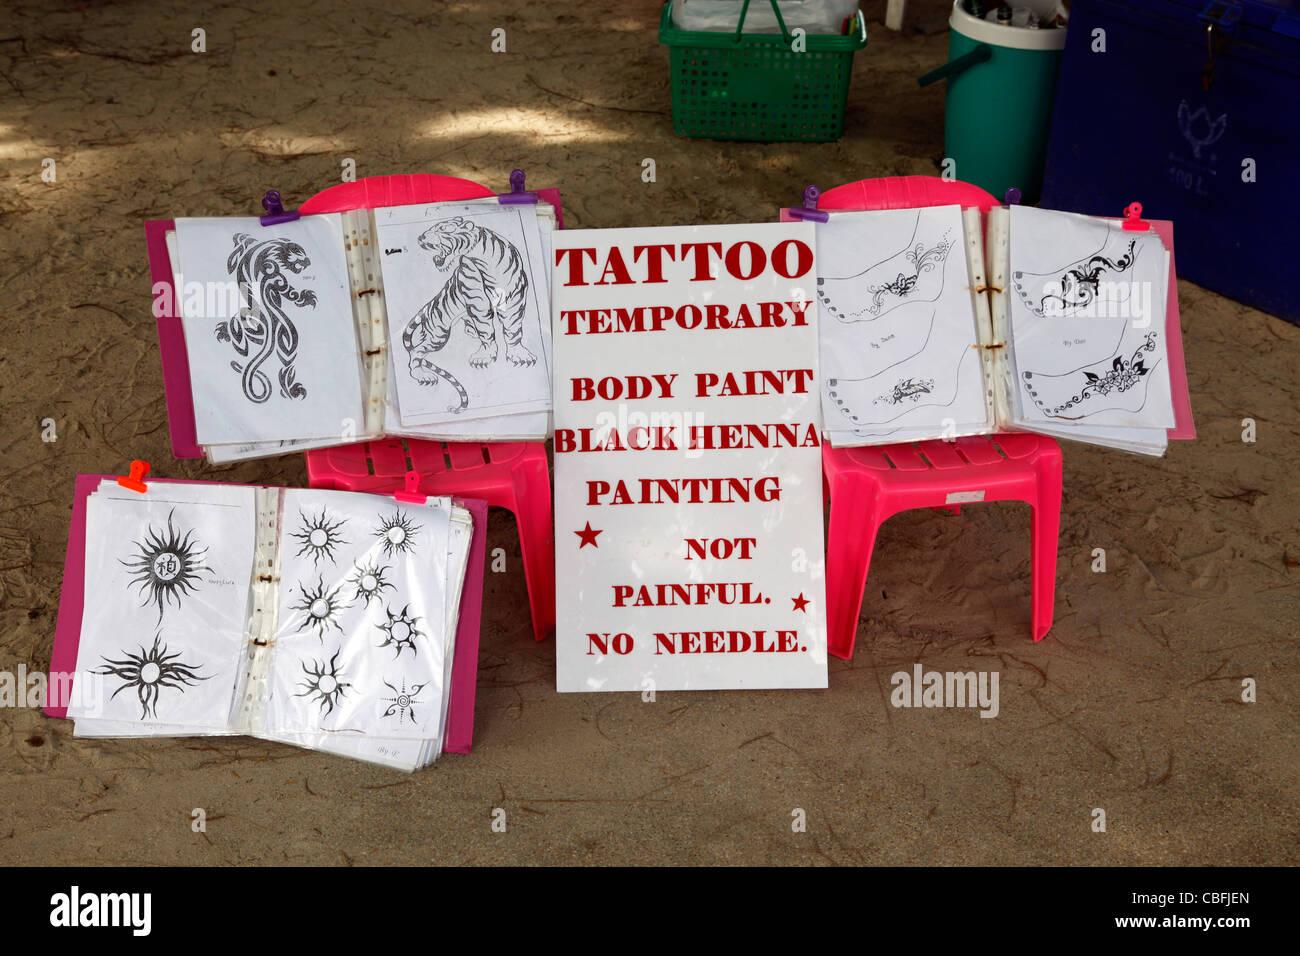 Henna Tattoo Thailand : Henna tattoo advert for temporary tattoos and body painting